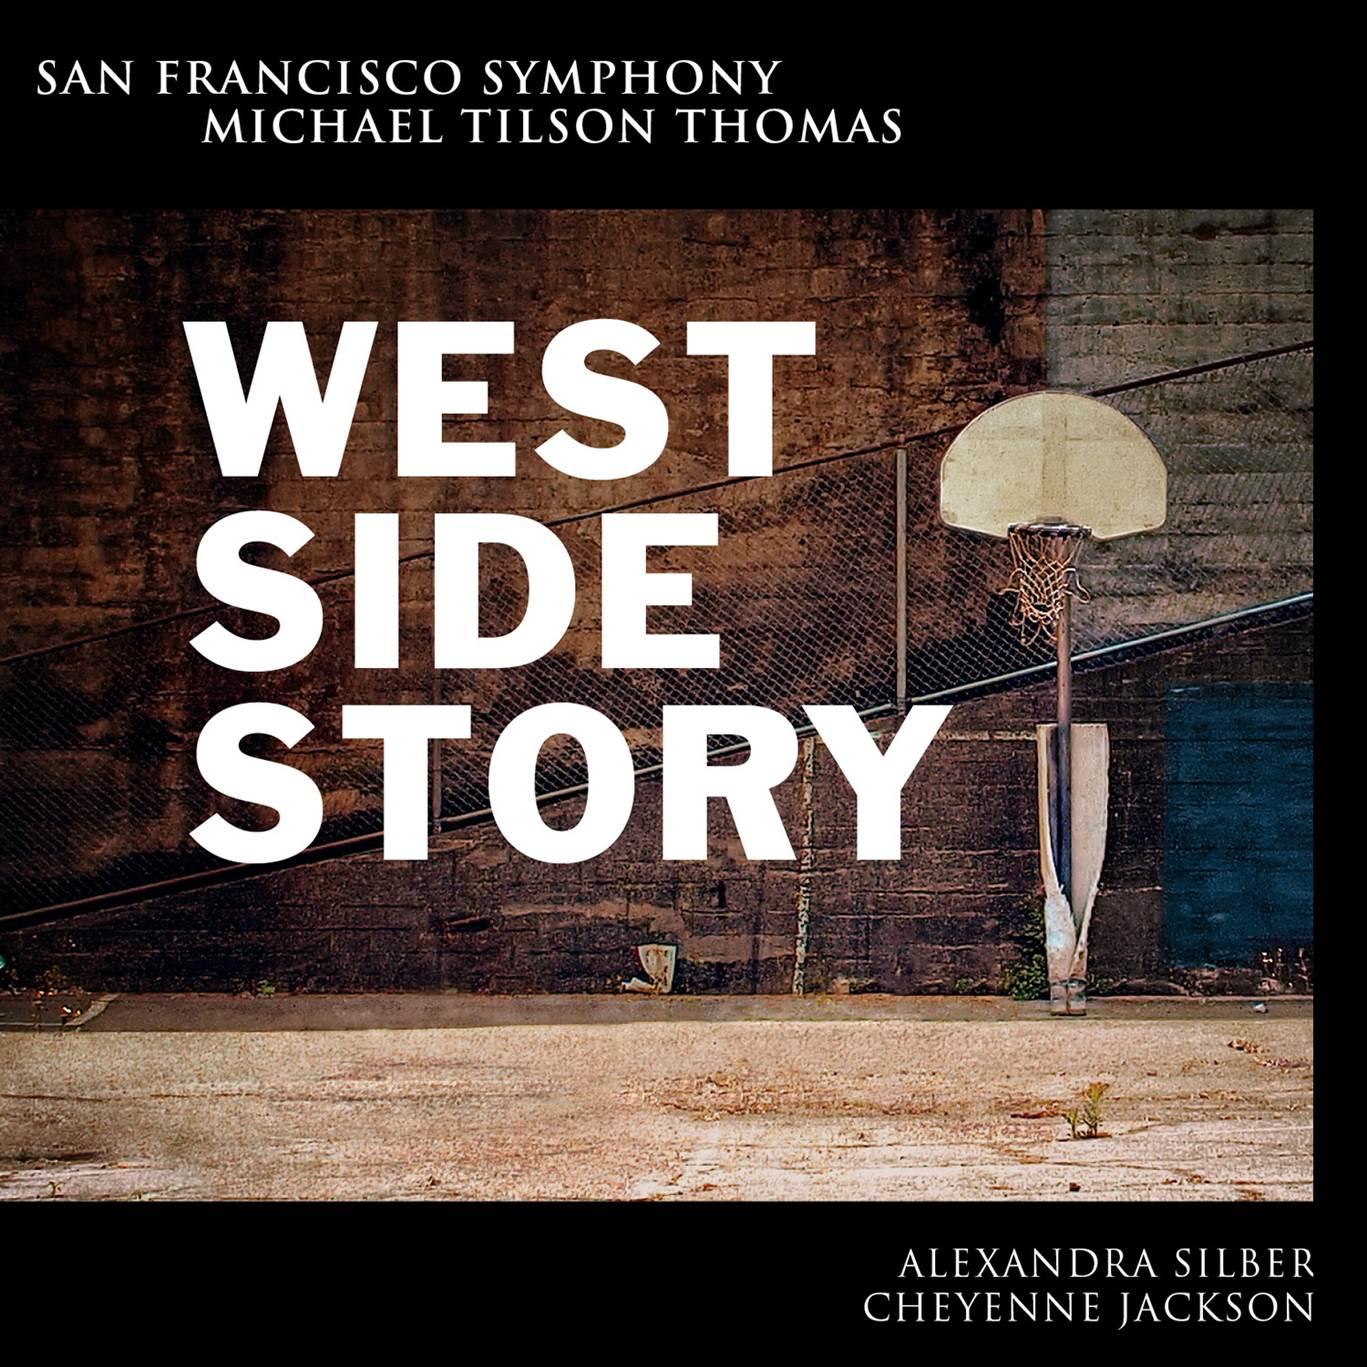 San Francisco Symphony - West Side Story - Cover image